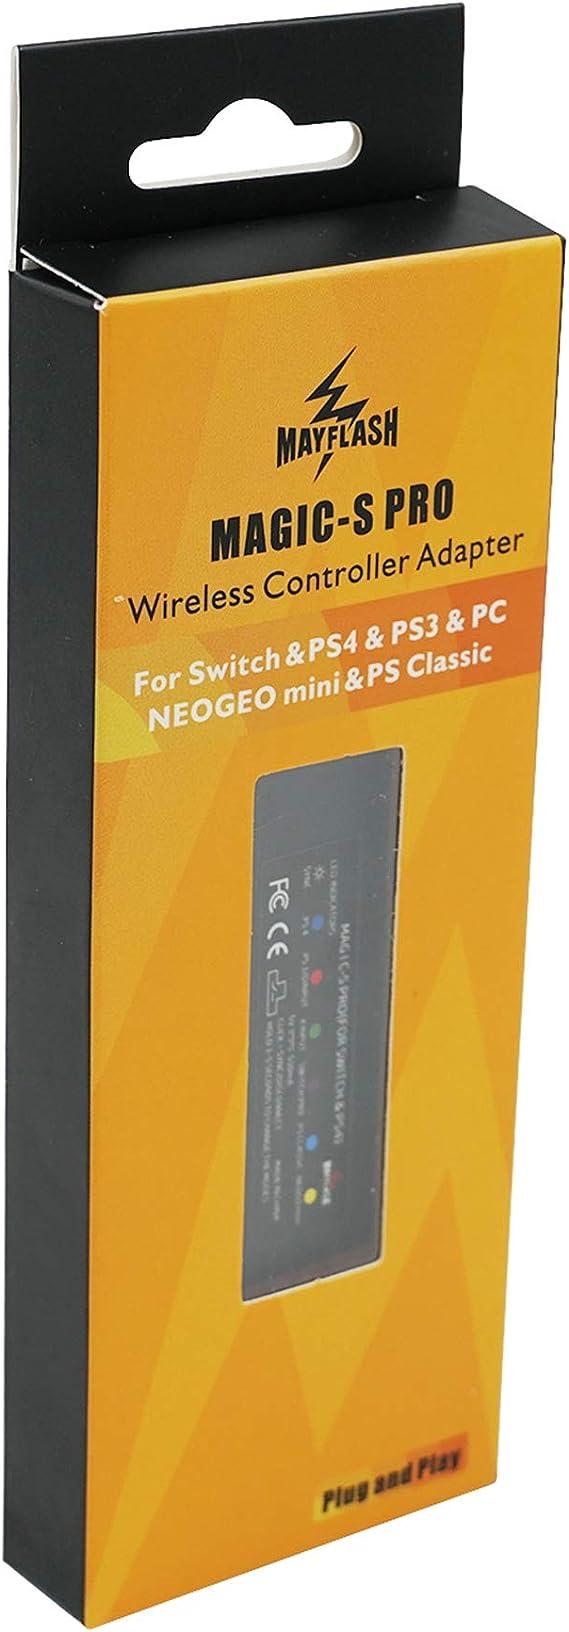 Mcbazel MAGIC-S Pro Wireless Controller Adapter for Nintendo Switch/PS4/PS3/PC/NEOGEO mini/PS Classic with Bottle Opener: Amazon.es: Videojuegos